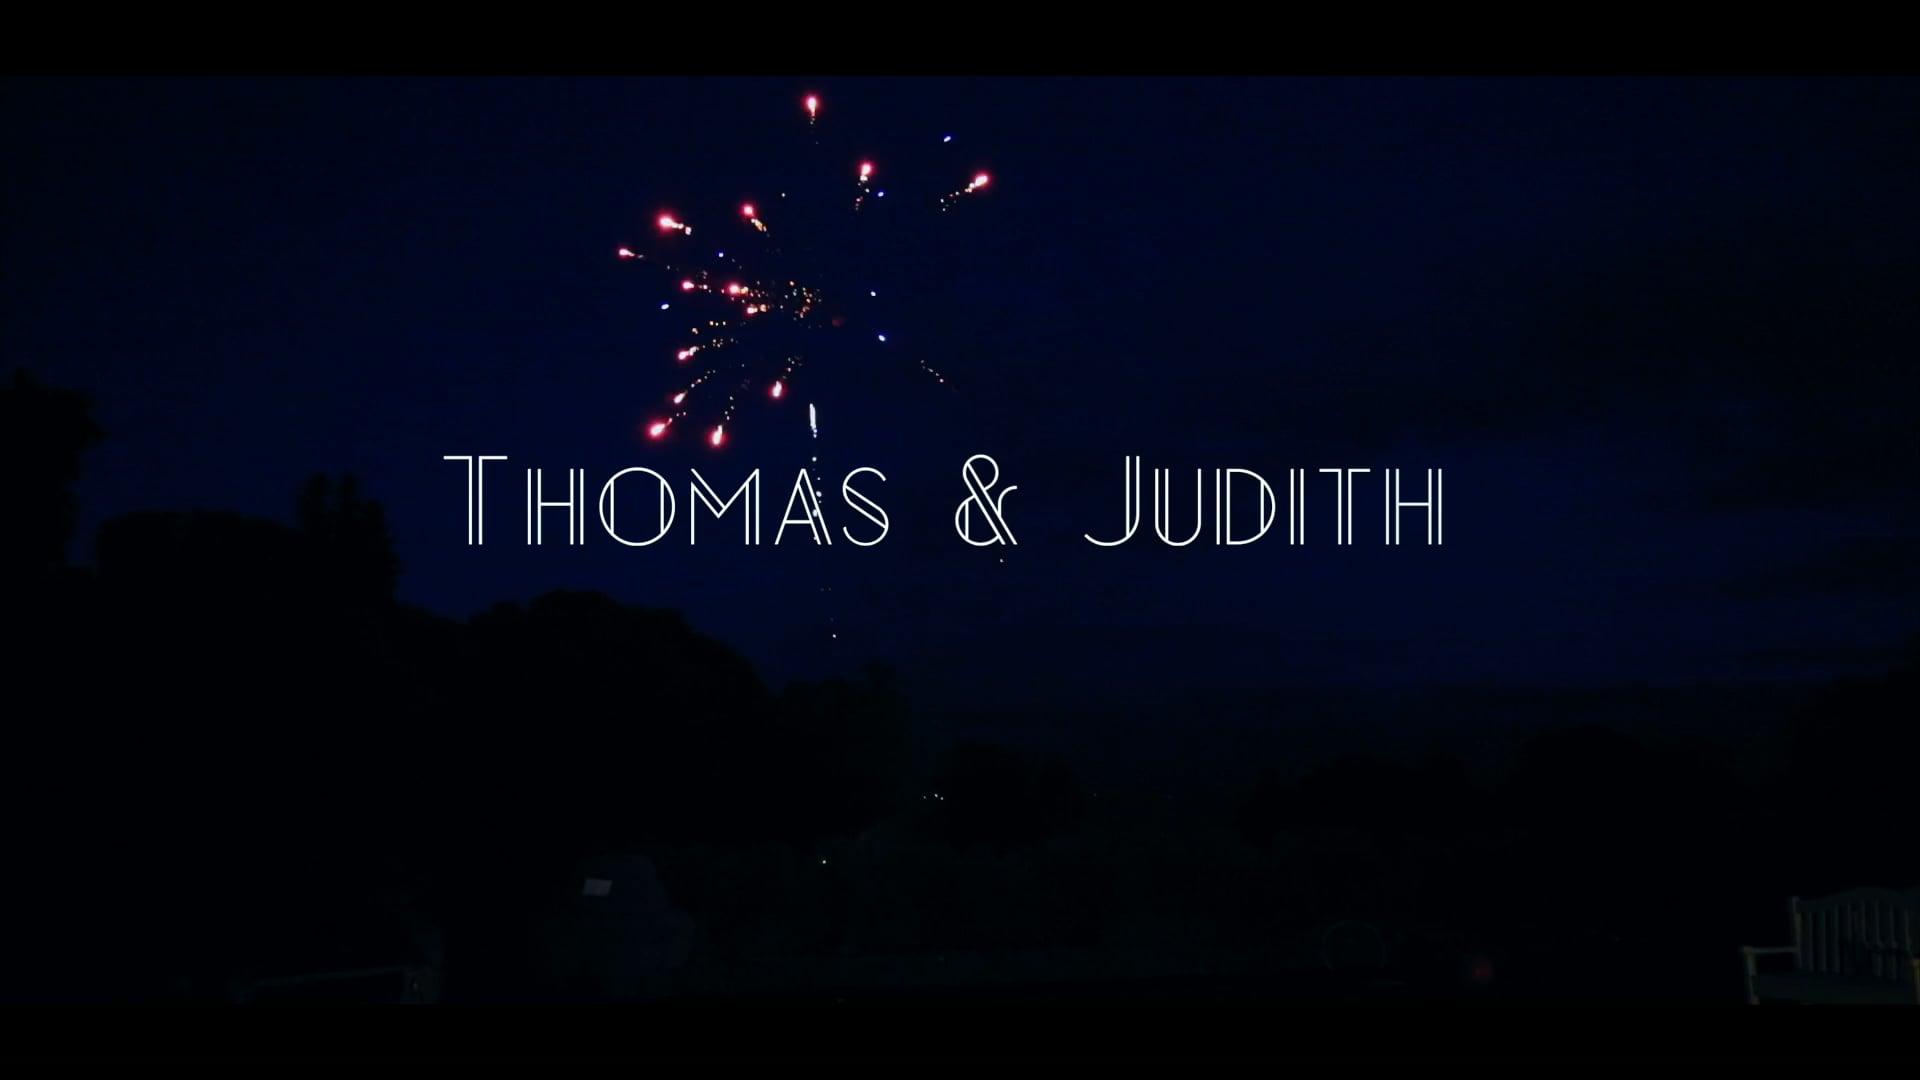 Thomas & Judith